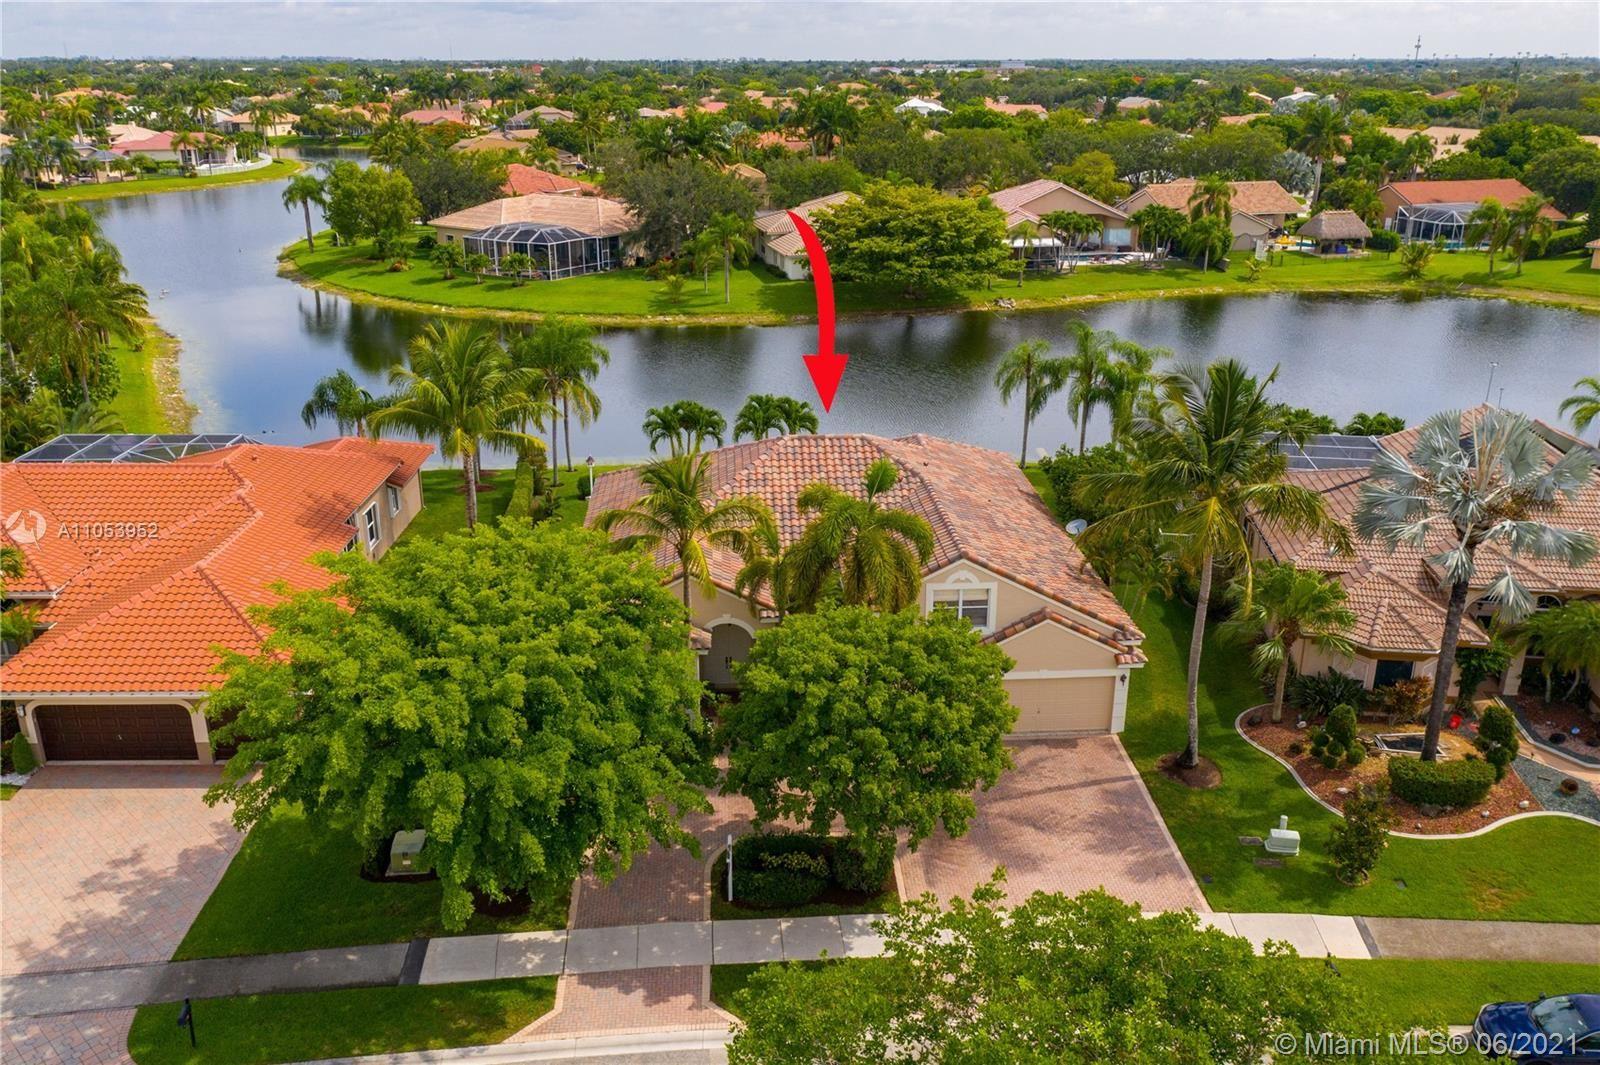 Photo of 5213 Kensington Cir, Coral Springs, FL 33076 (MLS # A11053952)